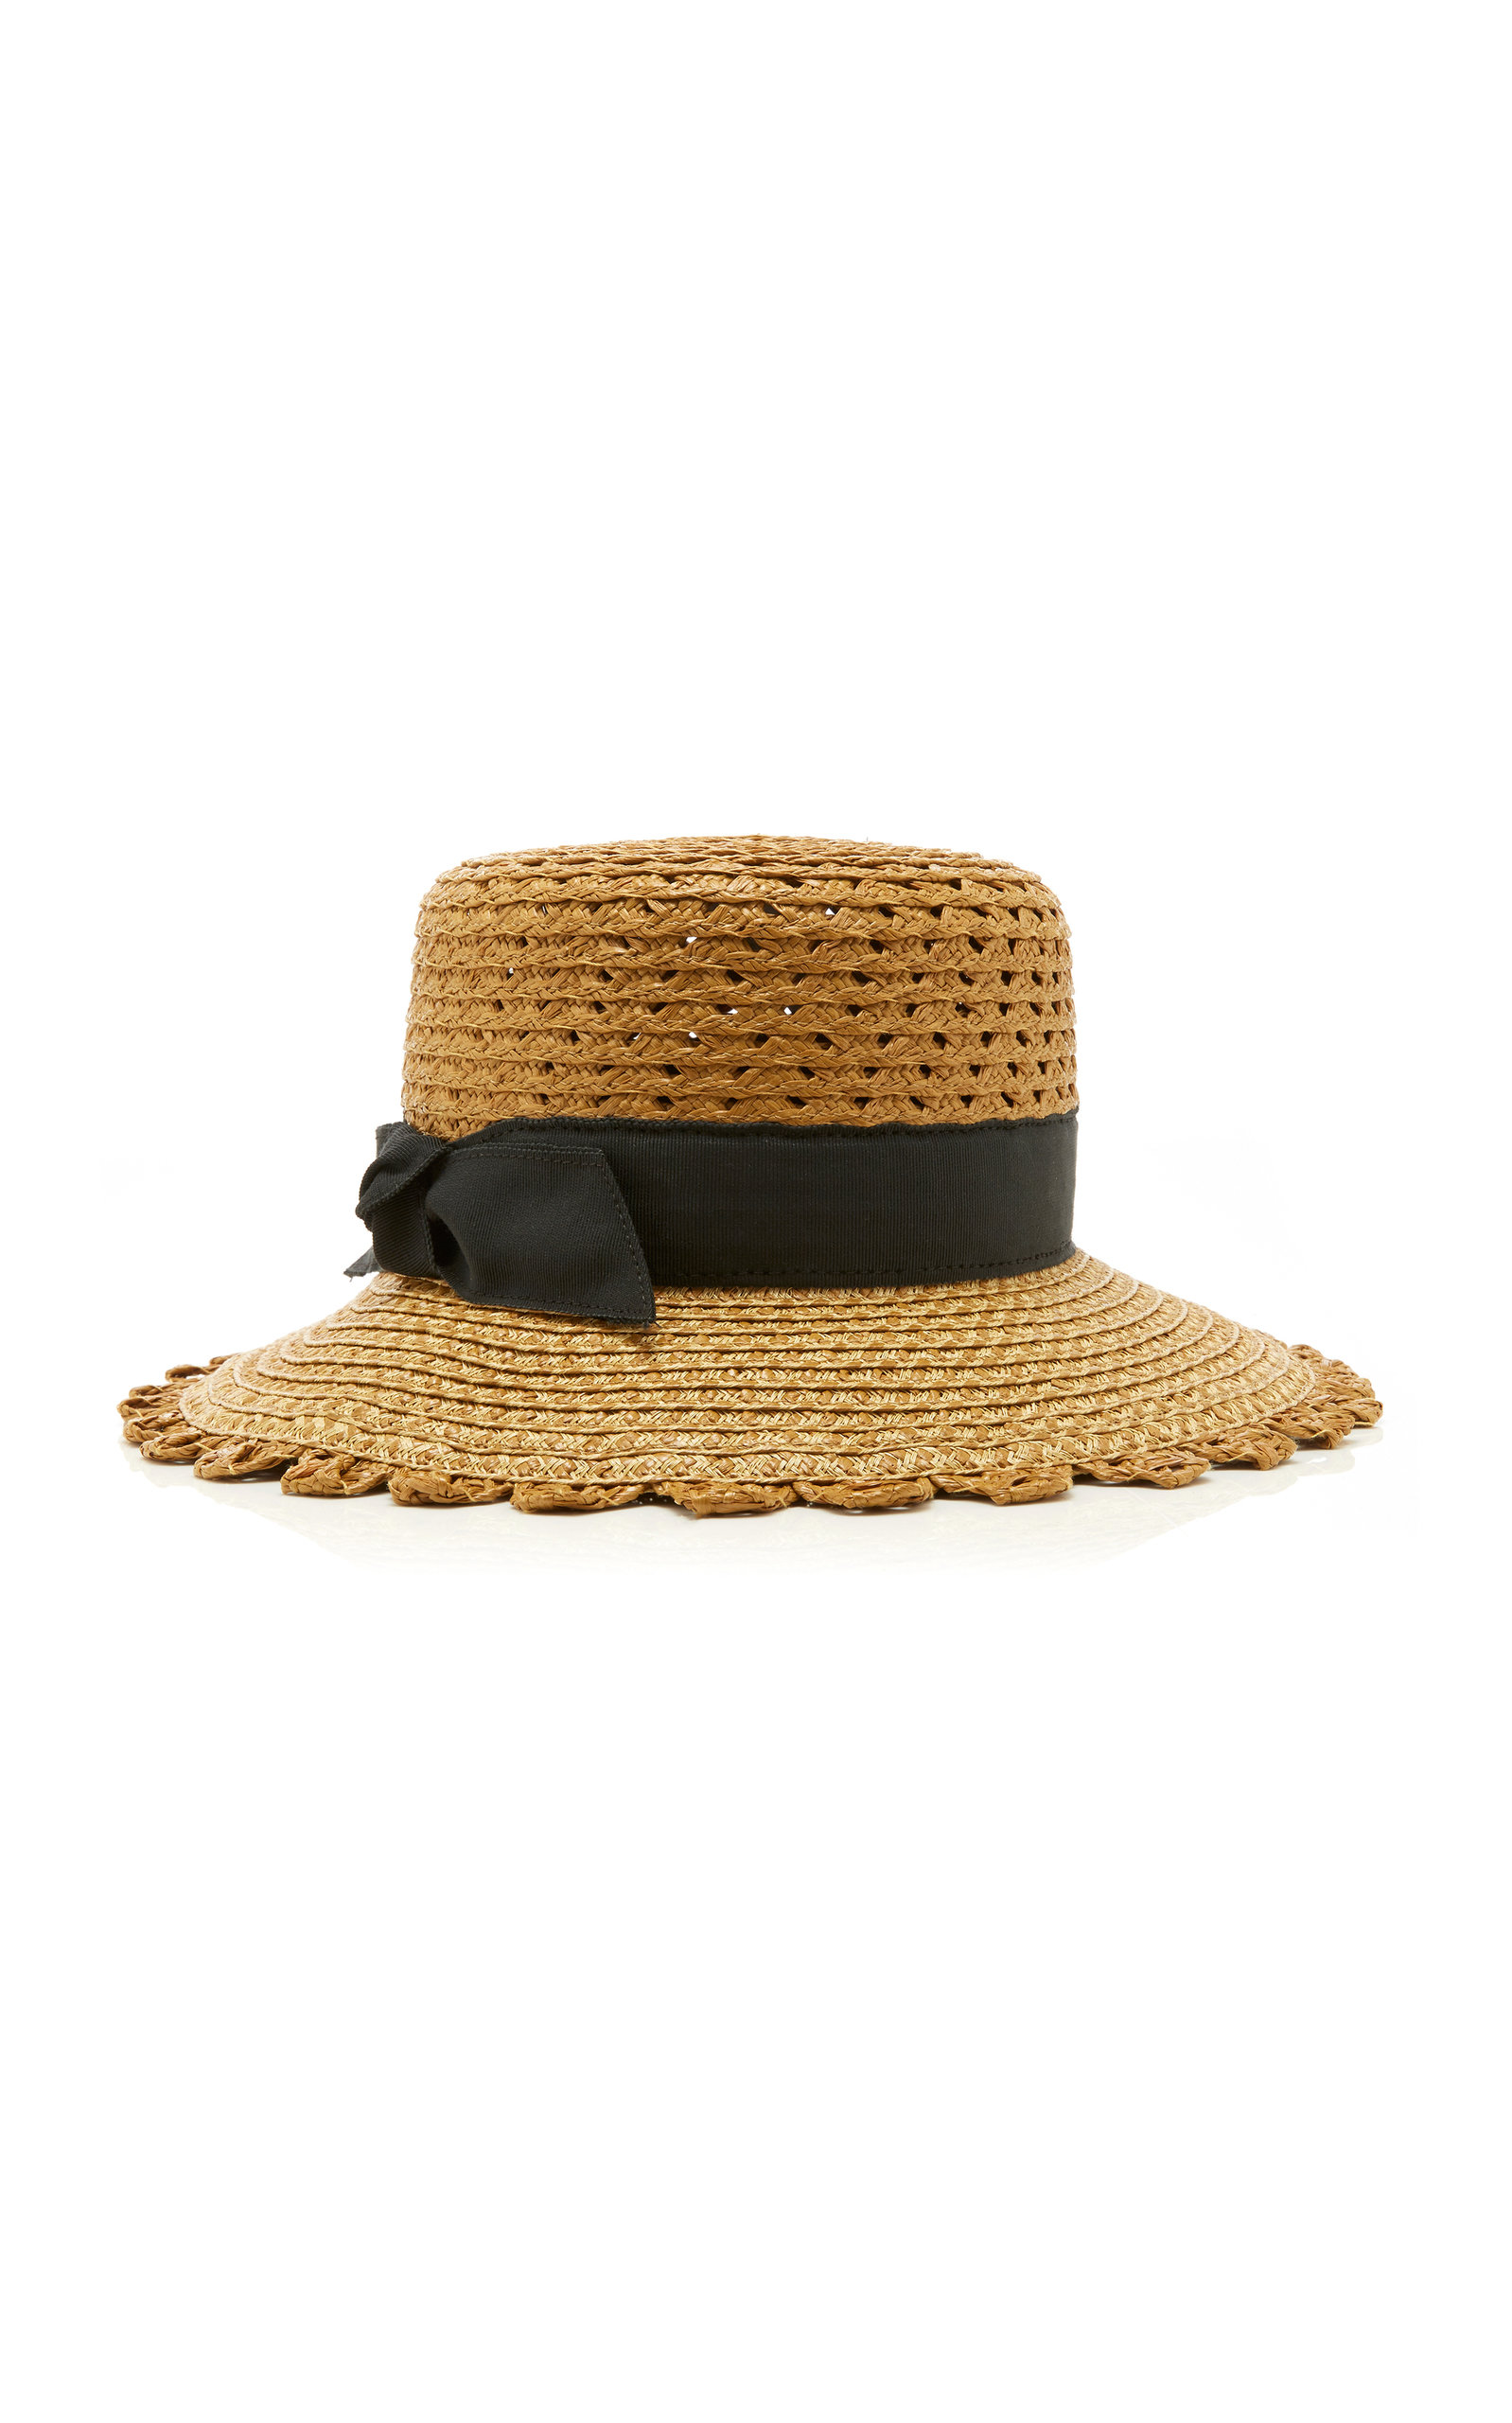 61102fbf5dd Eric Javits Montauk Grosgrain-Trim Straw Hat